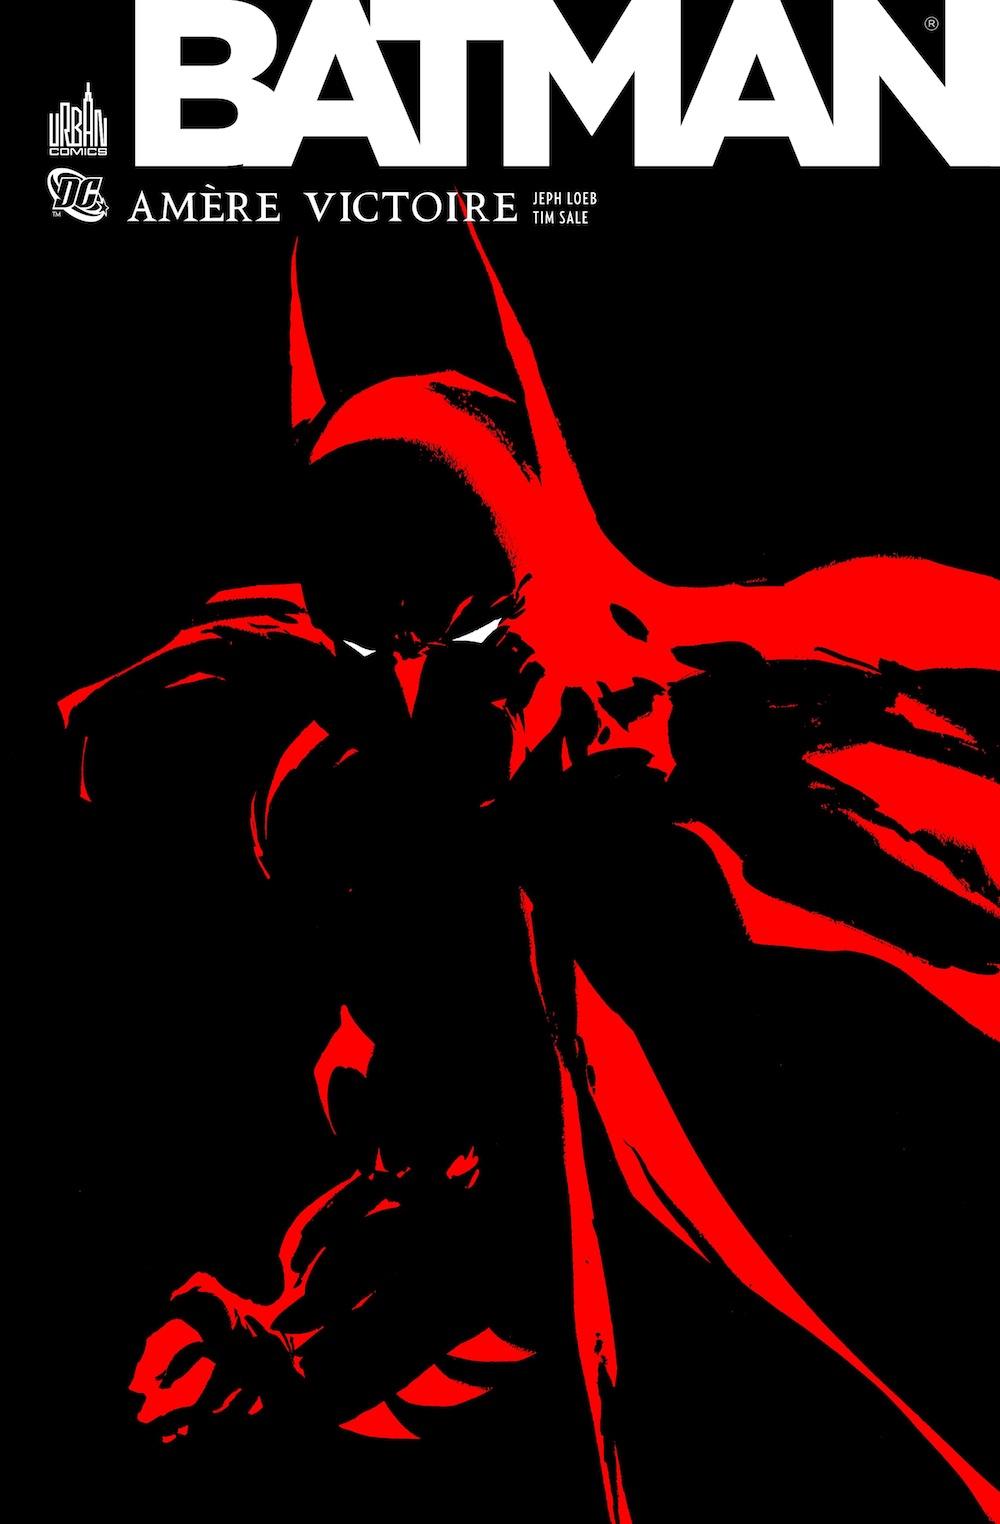 Chronologie de l 39 univers de batman wiki batman fandom - Batman contre joker ...